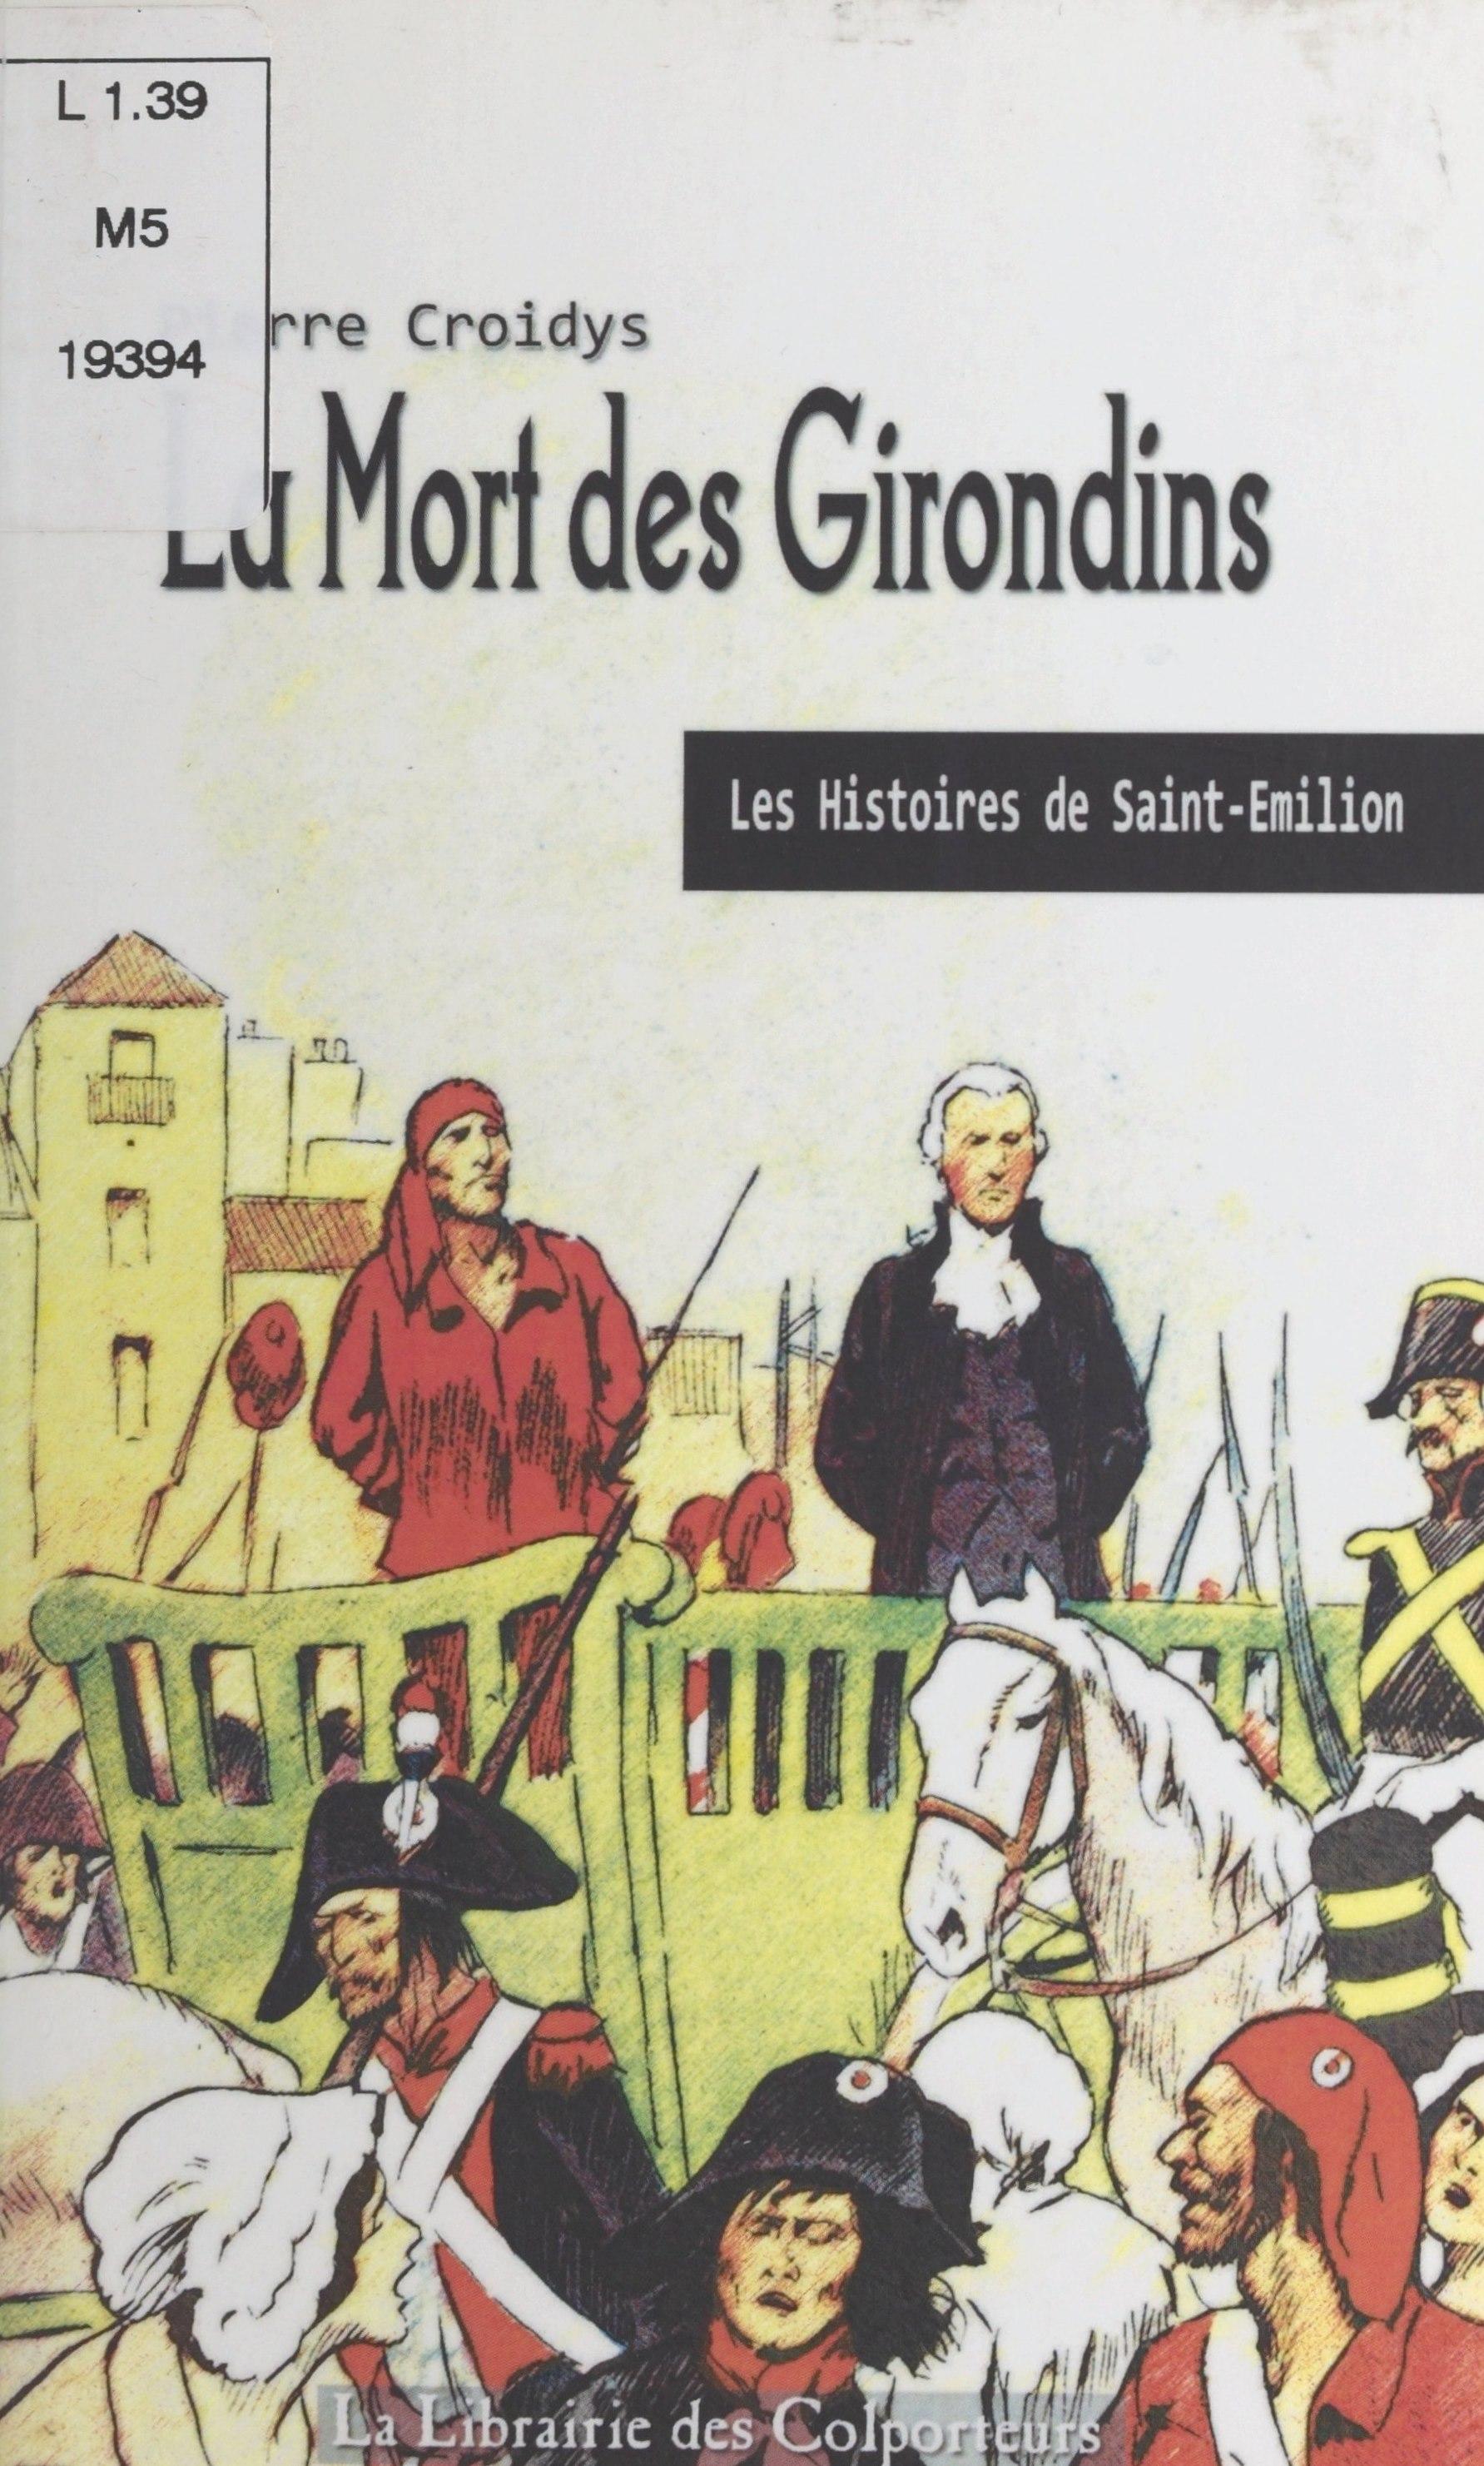 La mort des Girondins